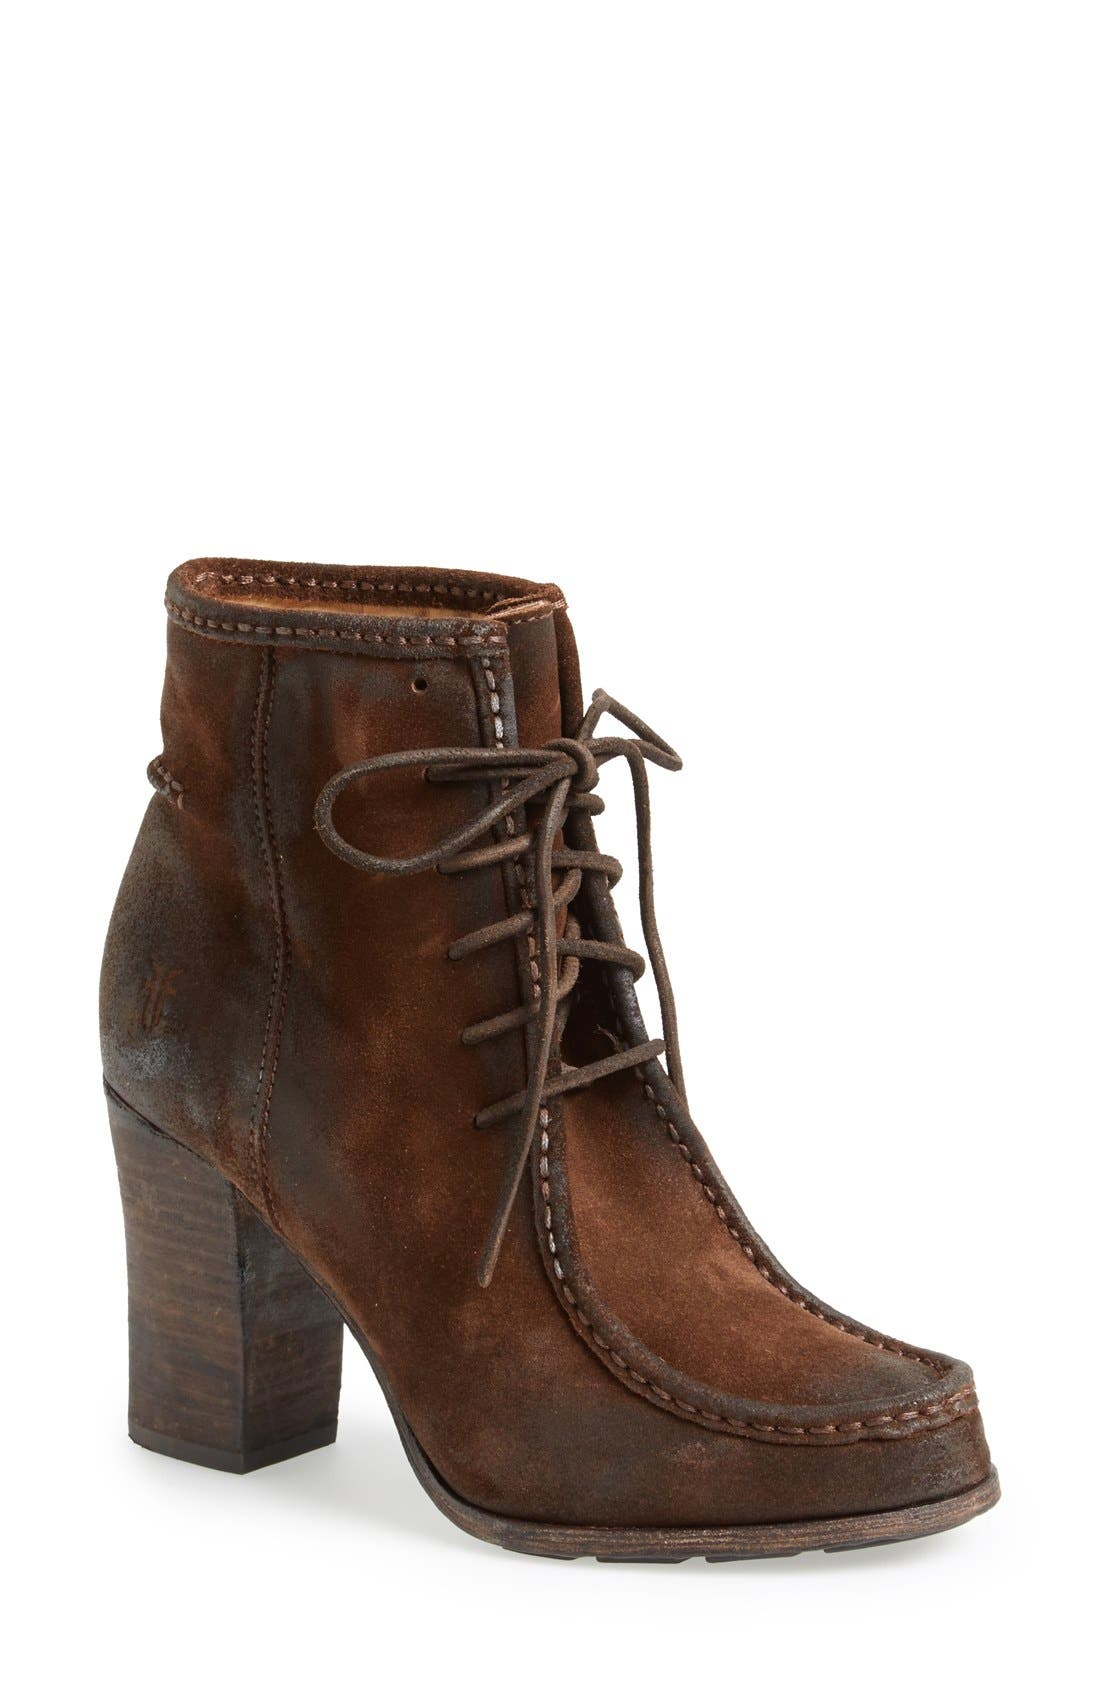 Main Image - Frye 'Parker' Suede Moc Toe Ankle Boot (Women)